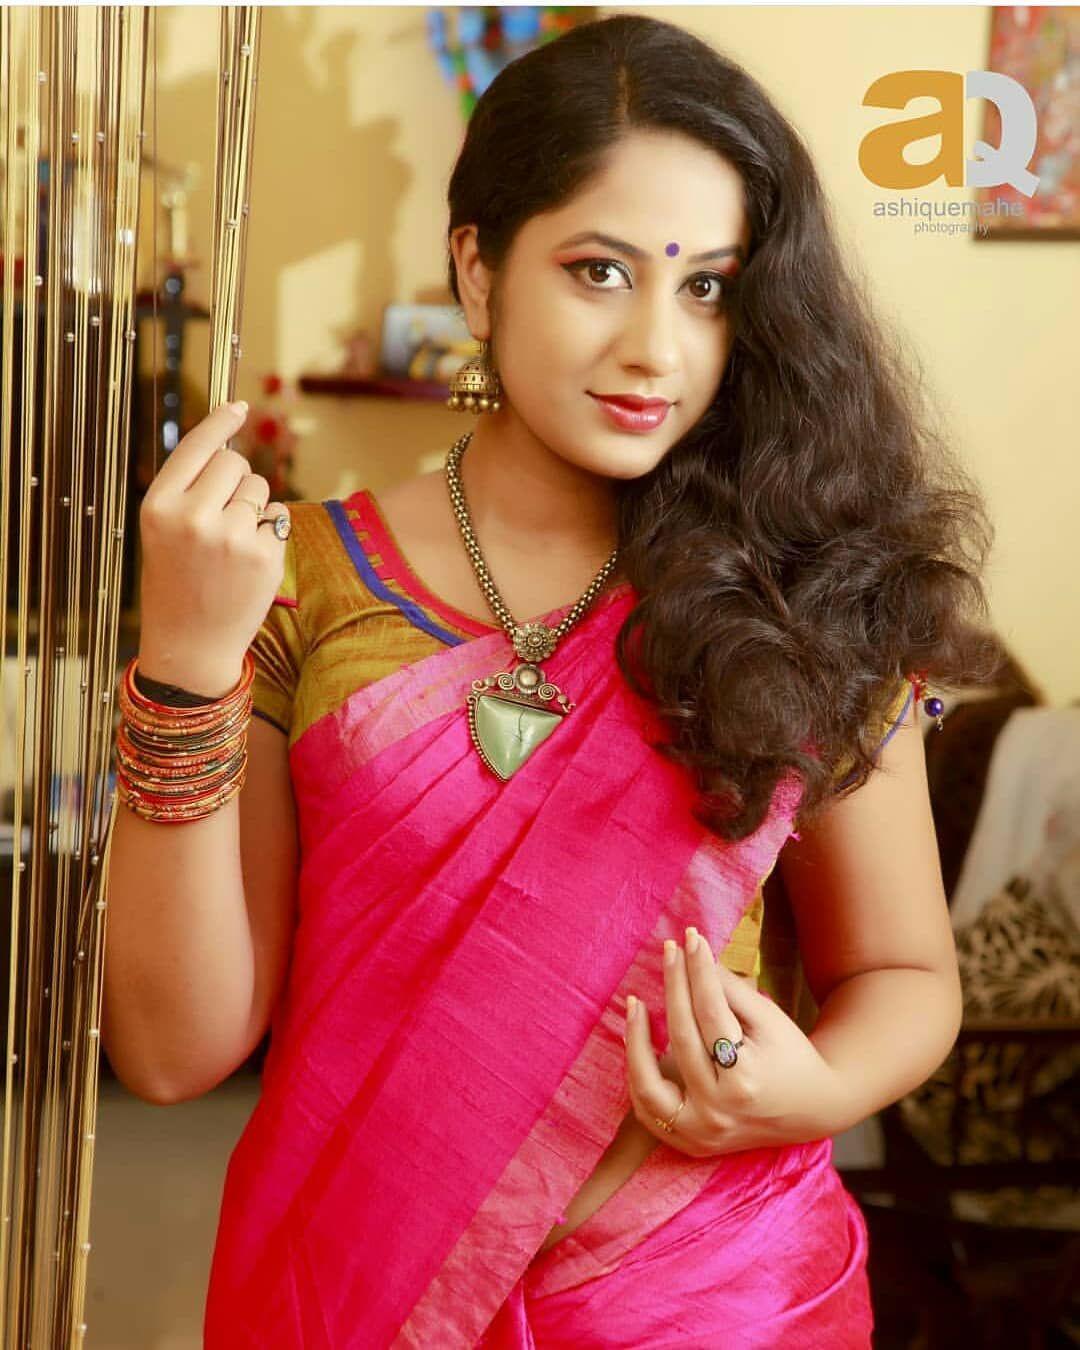 Gorgeous Indian Woman Jyothi Krisha | Beautiful in 2019 | Indian